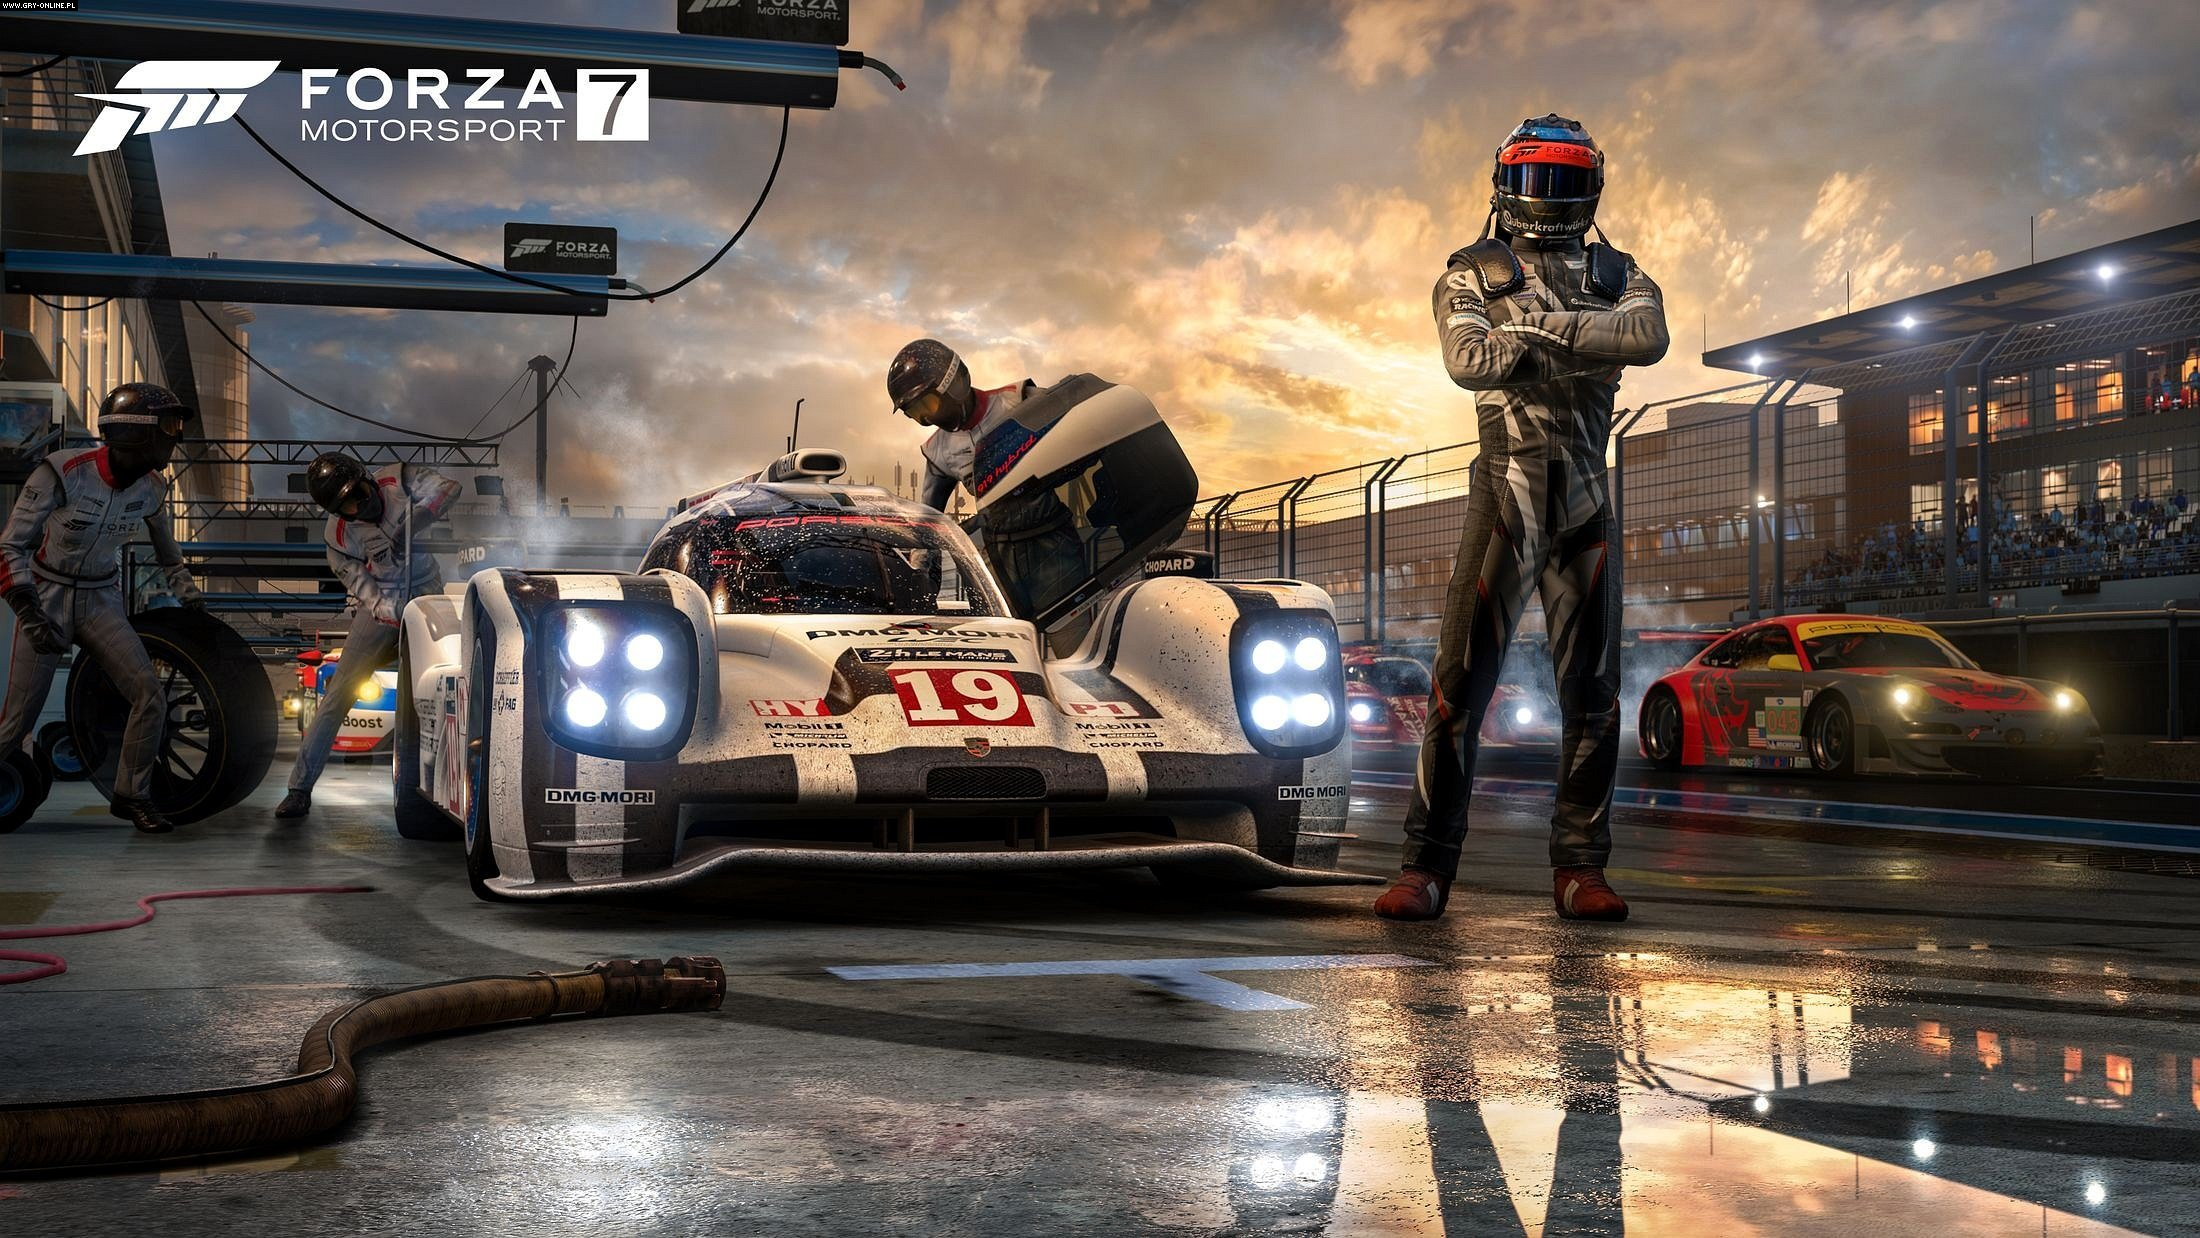 Forza Motorsport 7 XONE, PC Games Image 8/8, Turn 10 Studios, Microsoft Studios